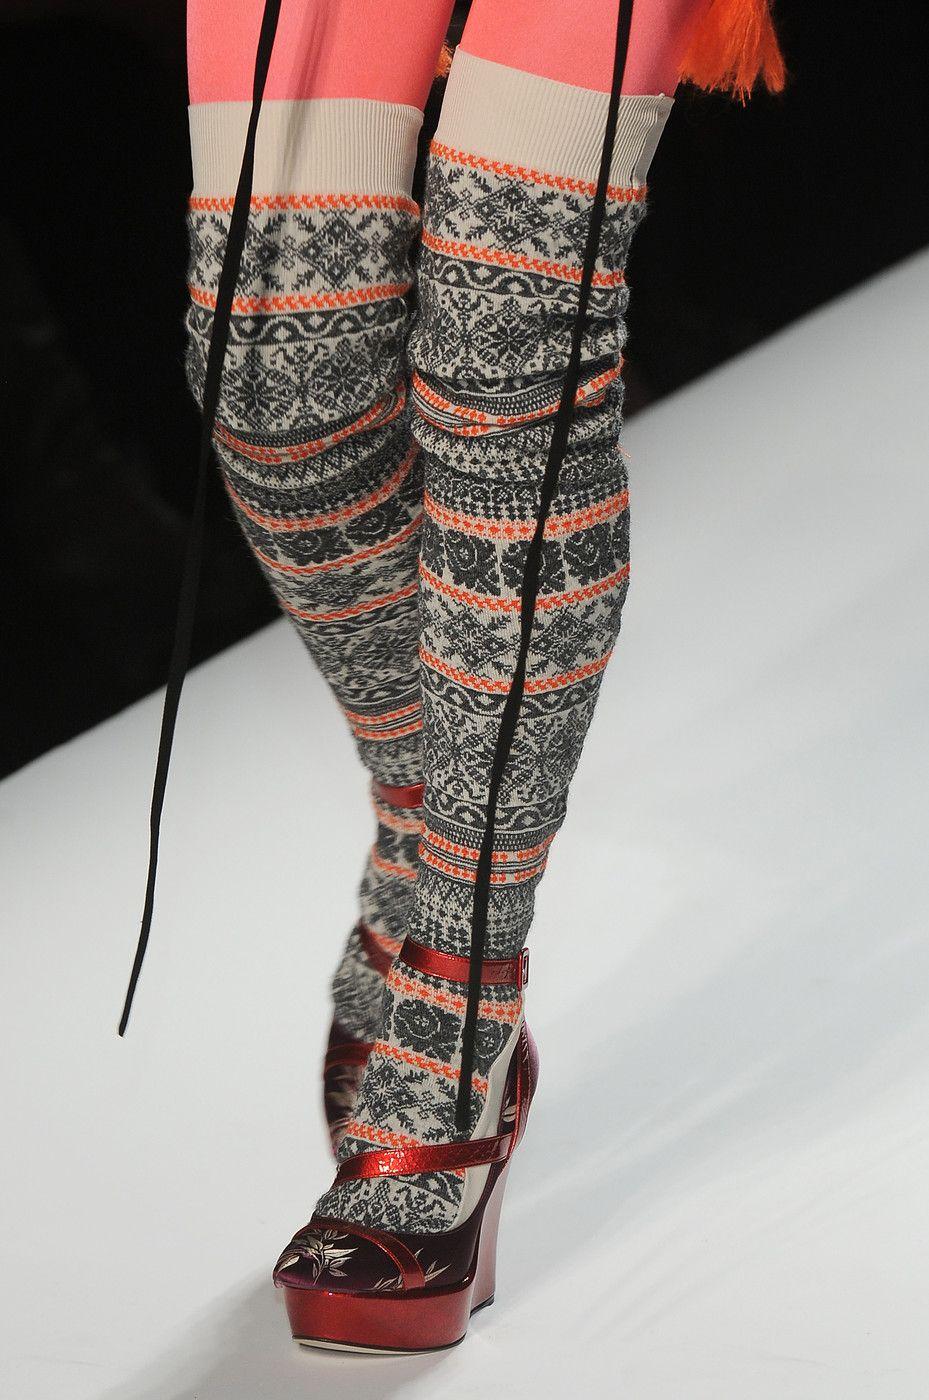 Jean Paul Gaultier at Paris Fashion Week Fall 2010 - Details Runway Photos